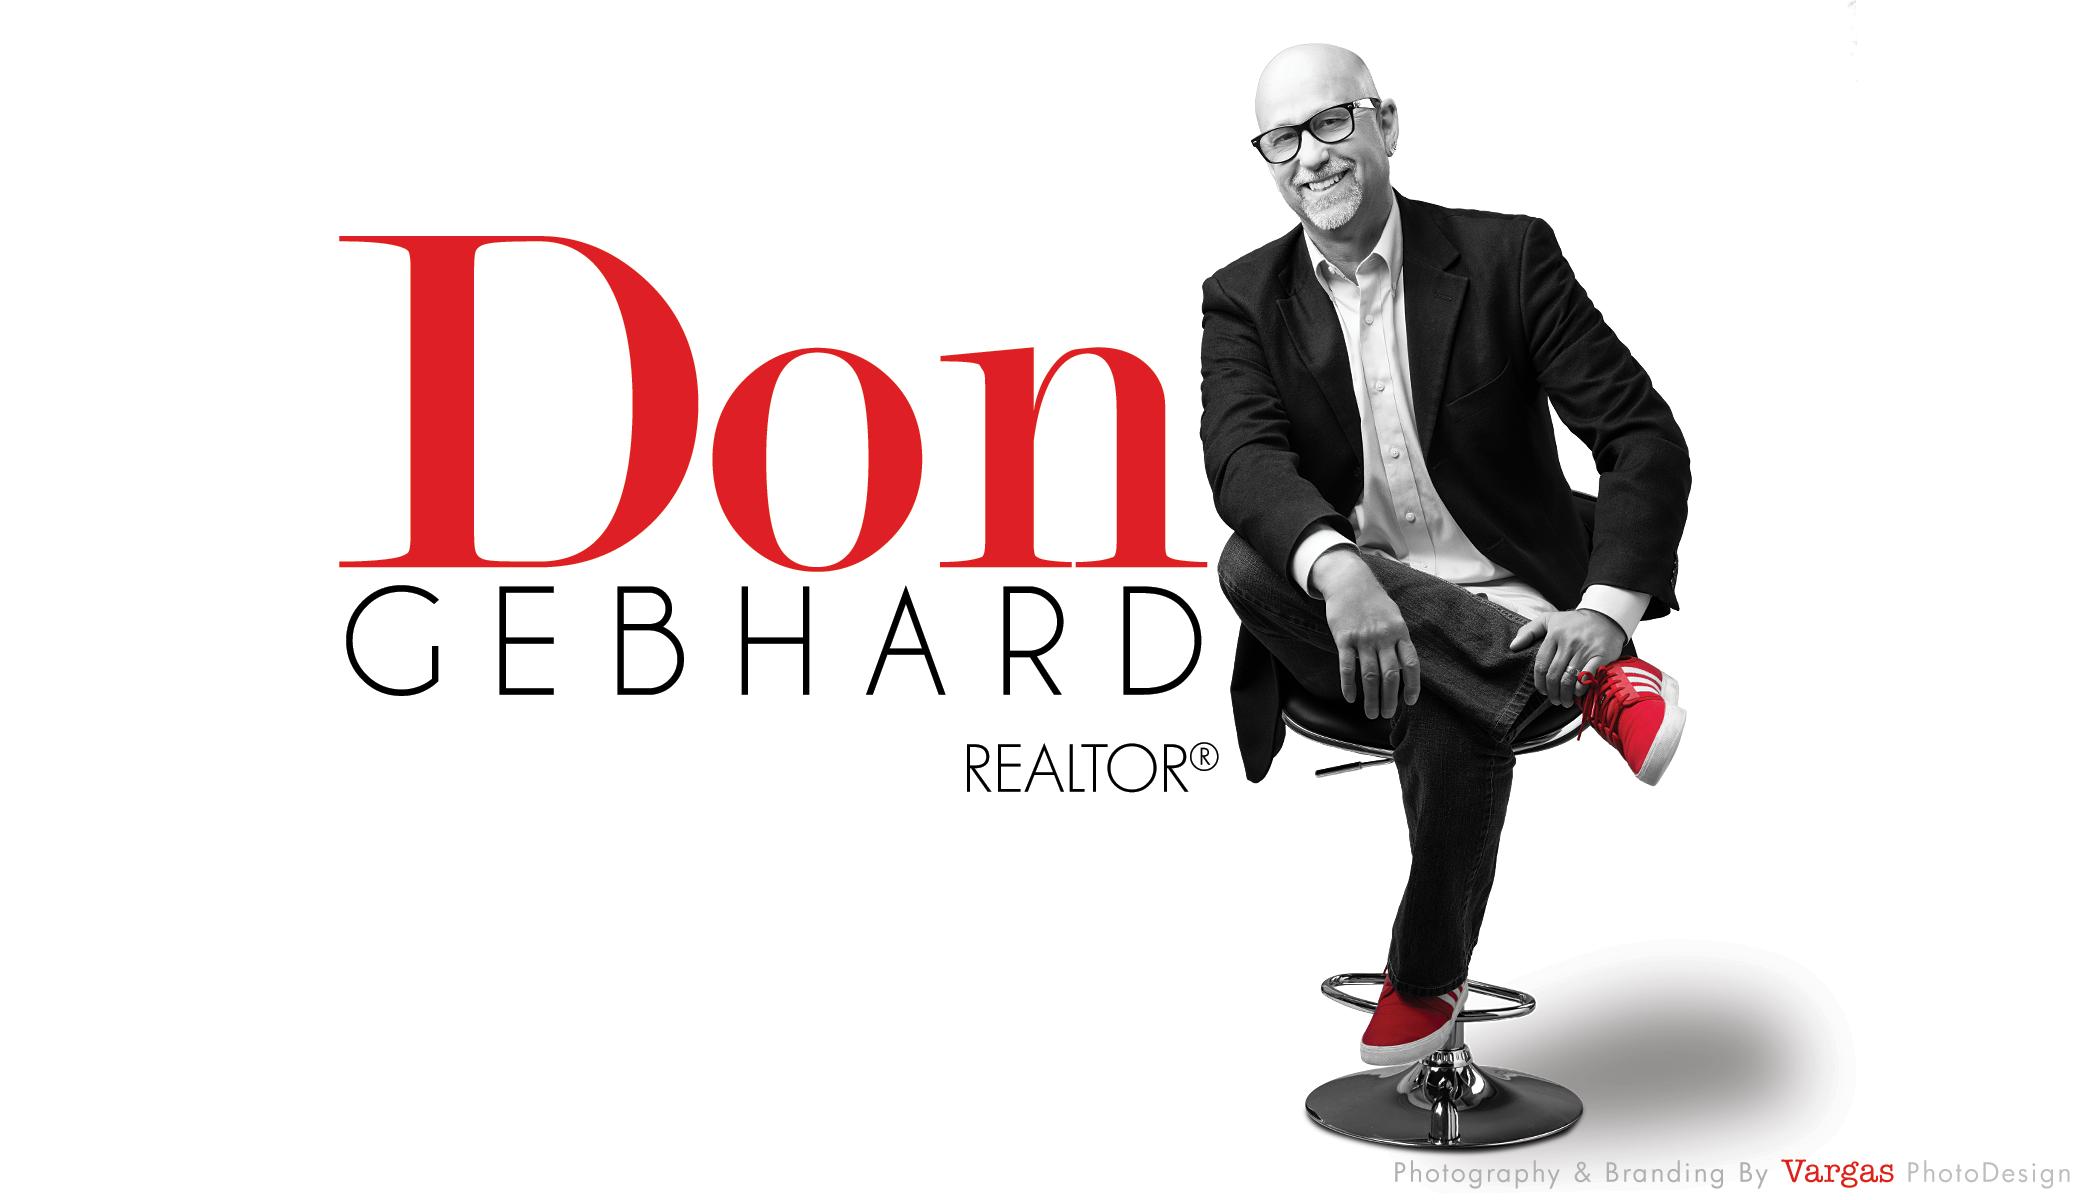 Don-Gebhard-Realtor-Branding.png